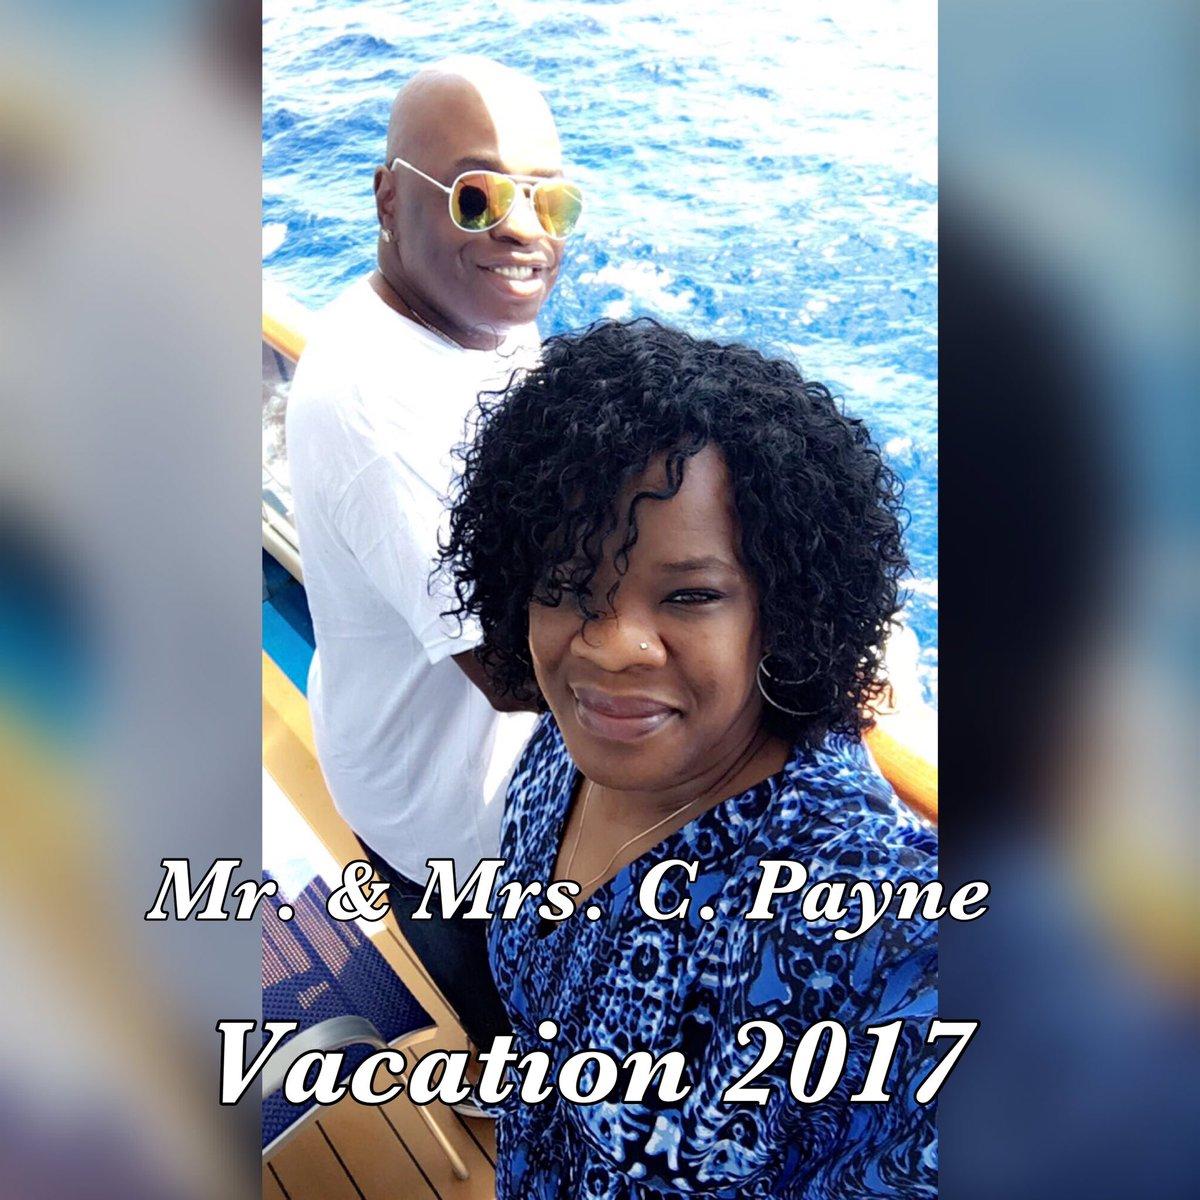 Mr. &amp; Mrs. C. Payne... Vacation 2017 #PositiveVibes #focused #love #blessed #motivation #inspiration #coach #mentor #friend #Entrepreneur<br>http://pic.twitter.com/sPTAtyLUYG